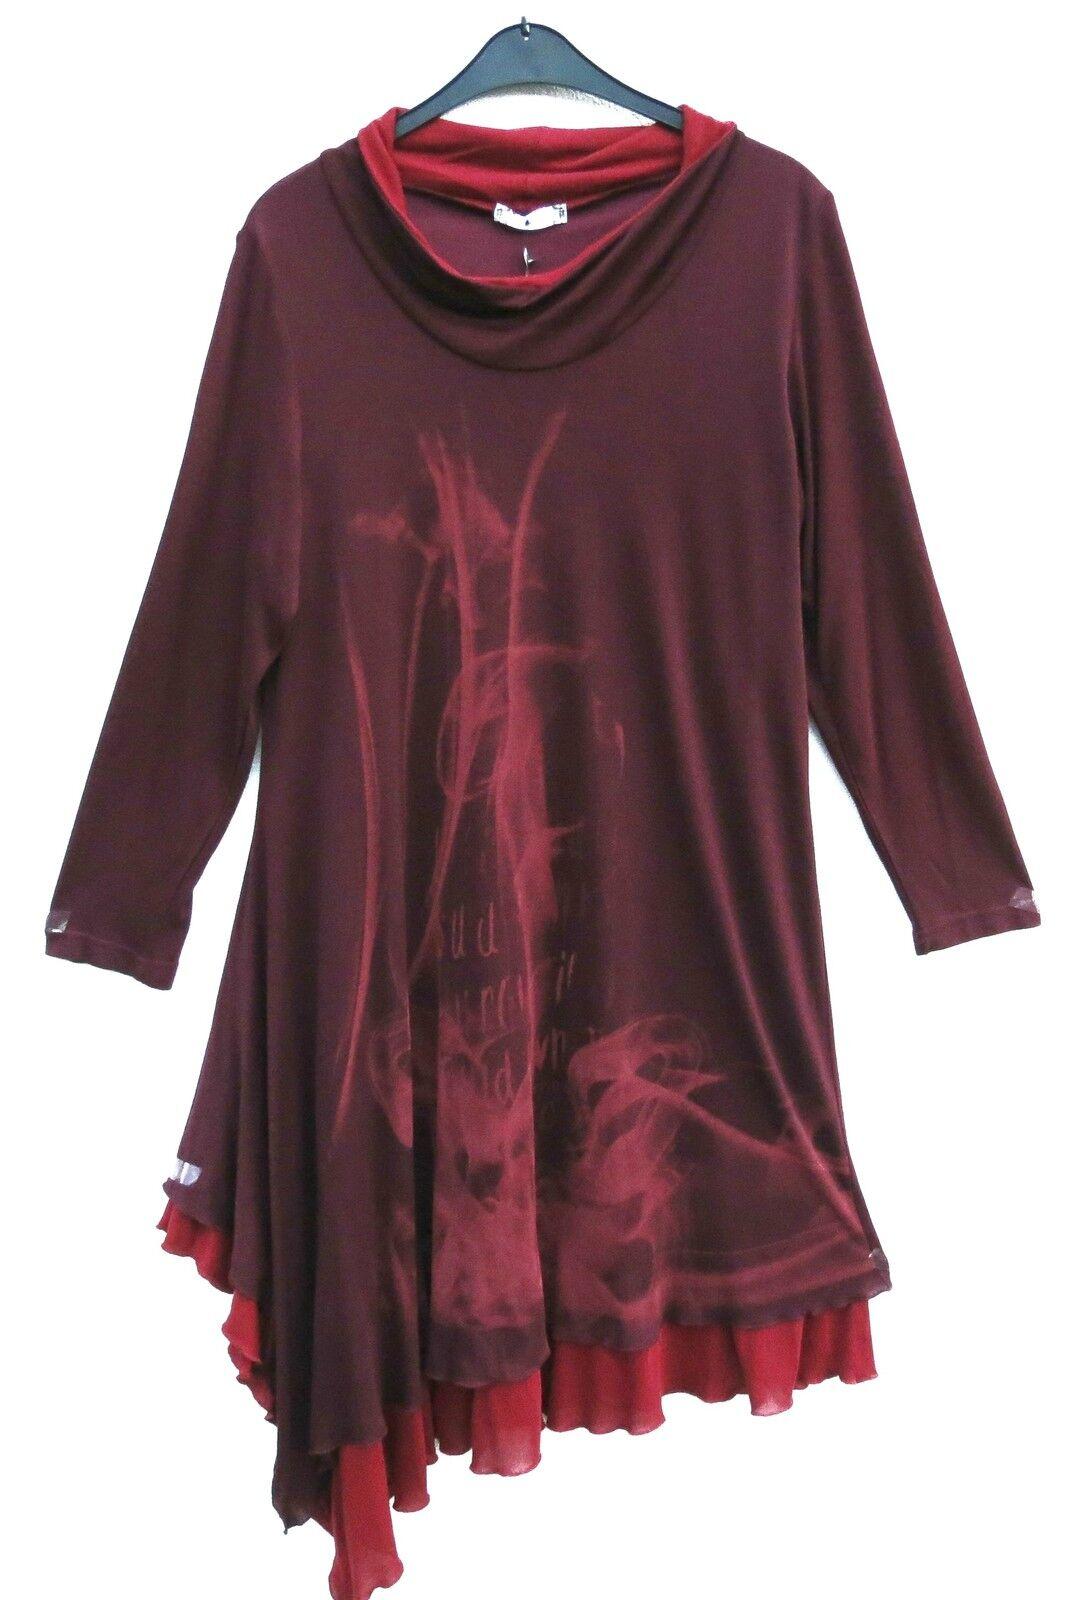 LA MOUETTE TRAUMHAFT Kleid Dress Robe Vestido Tunika Tunic L 44 46 Lagenlook